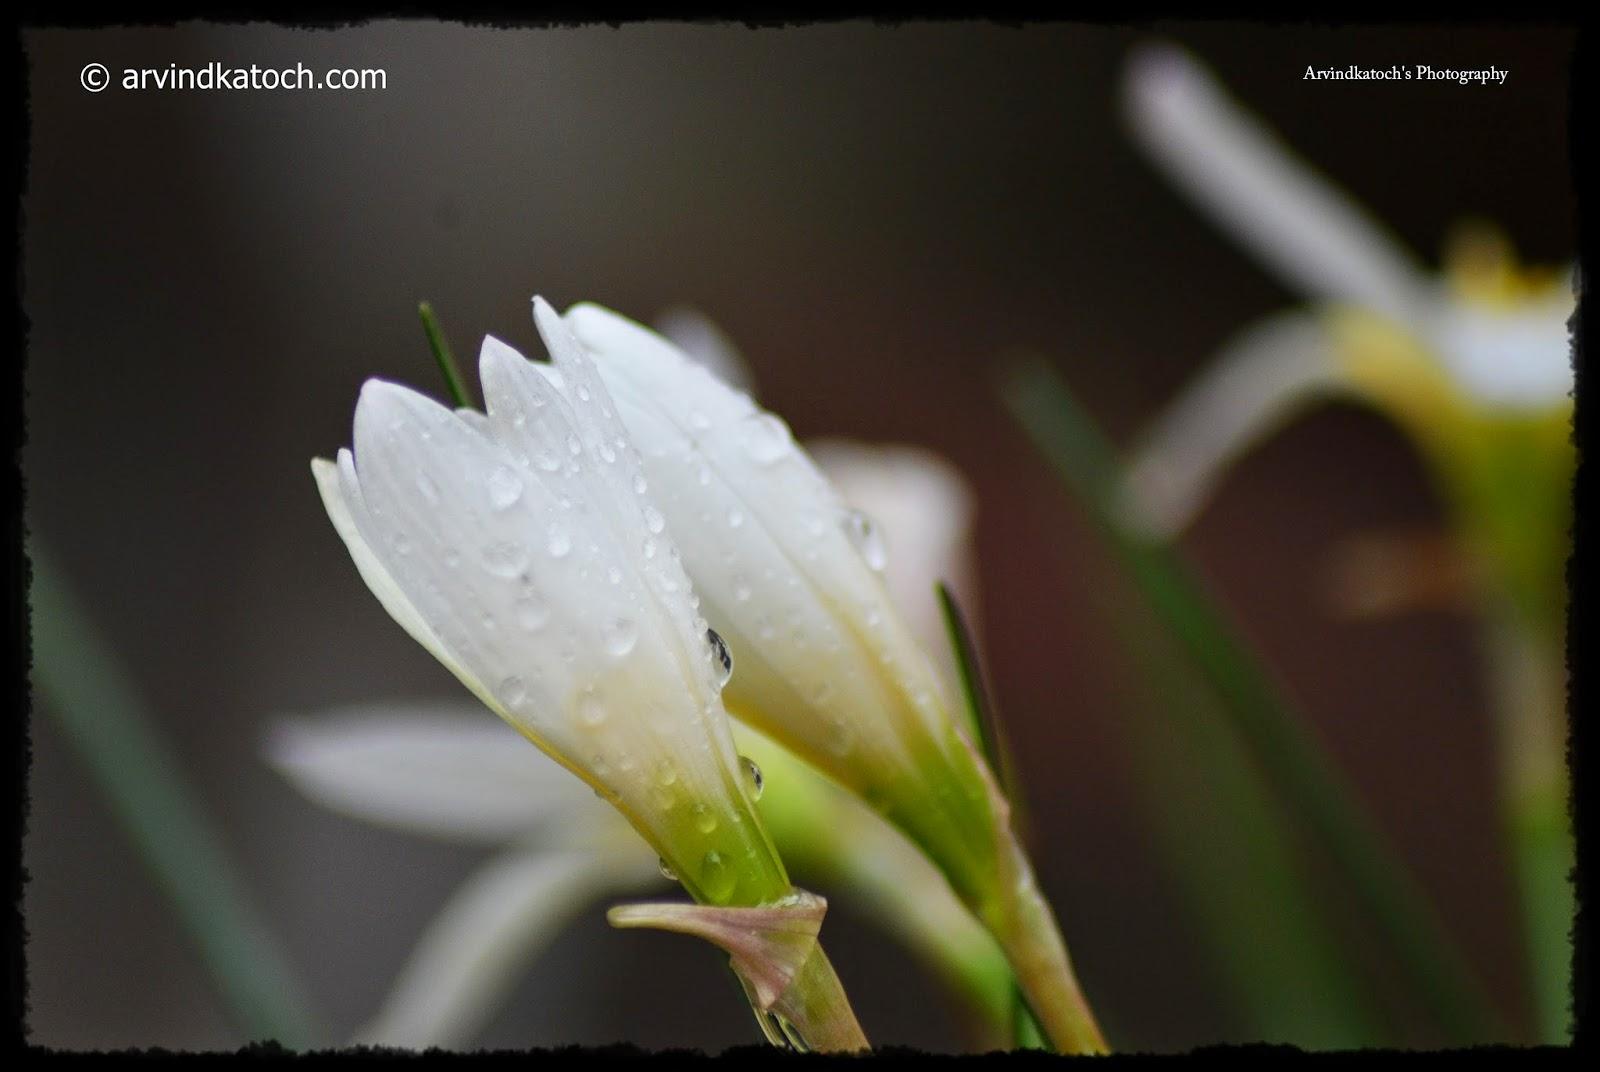 White Grass, Flower, Rain drops